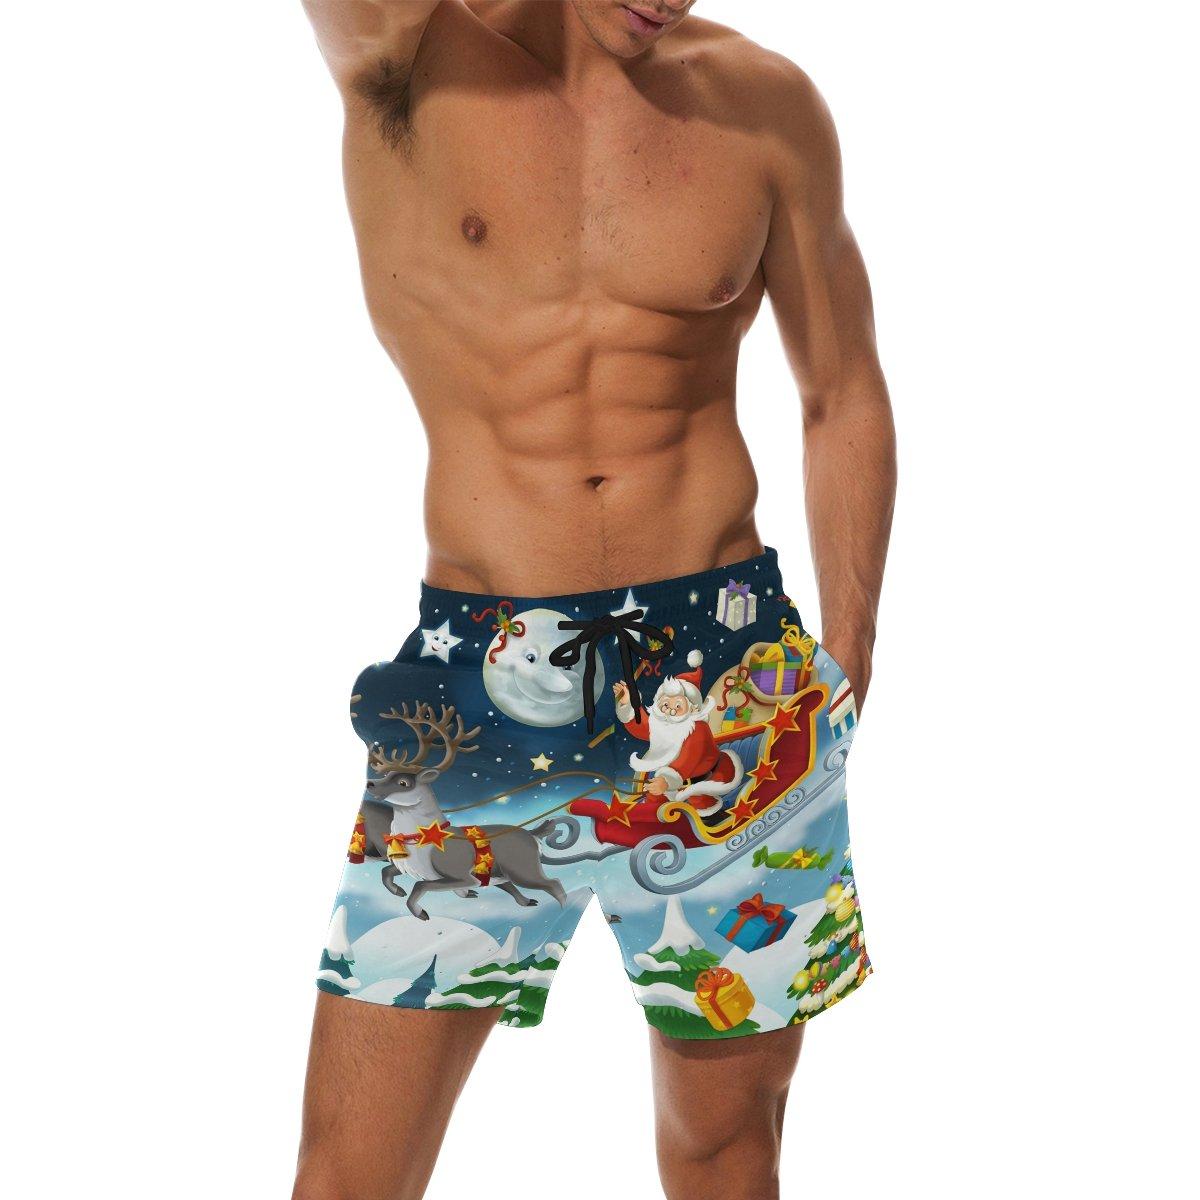 0dbb405fde COOSUN Men's Christmas Santa Claus Beach Board Shorts Quick Dry Swim Trunk:  Amazon.co.uk: Clothing